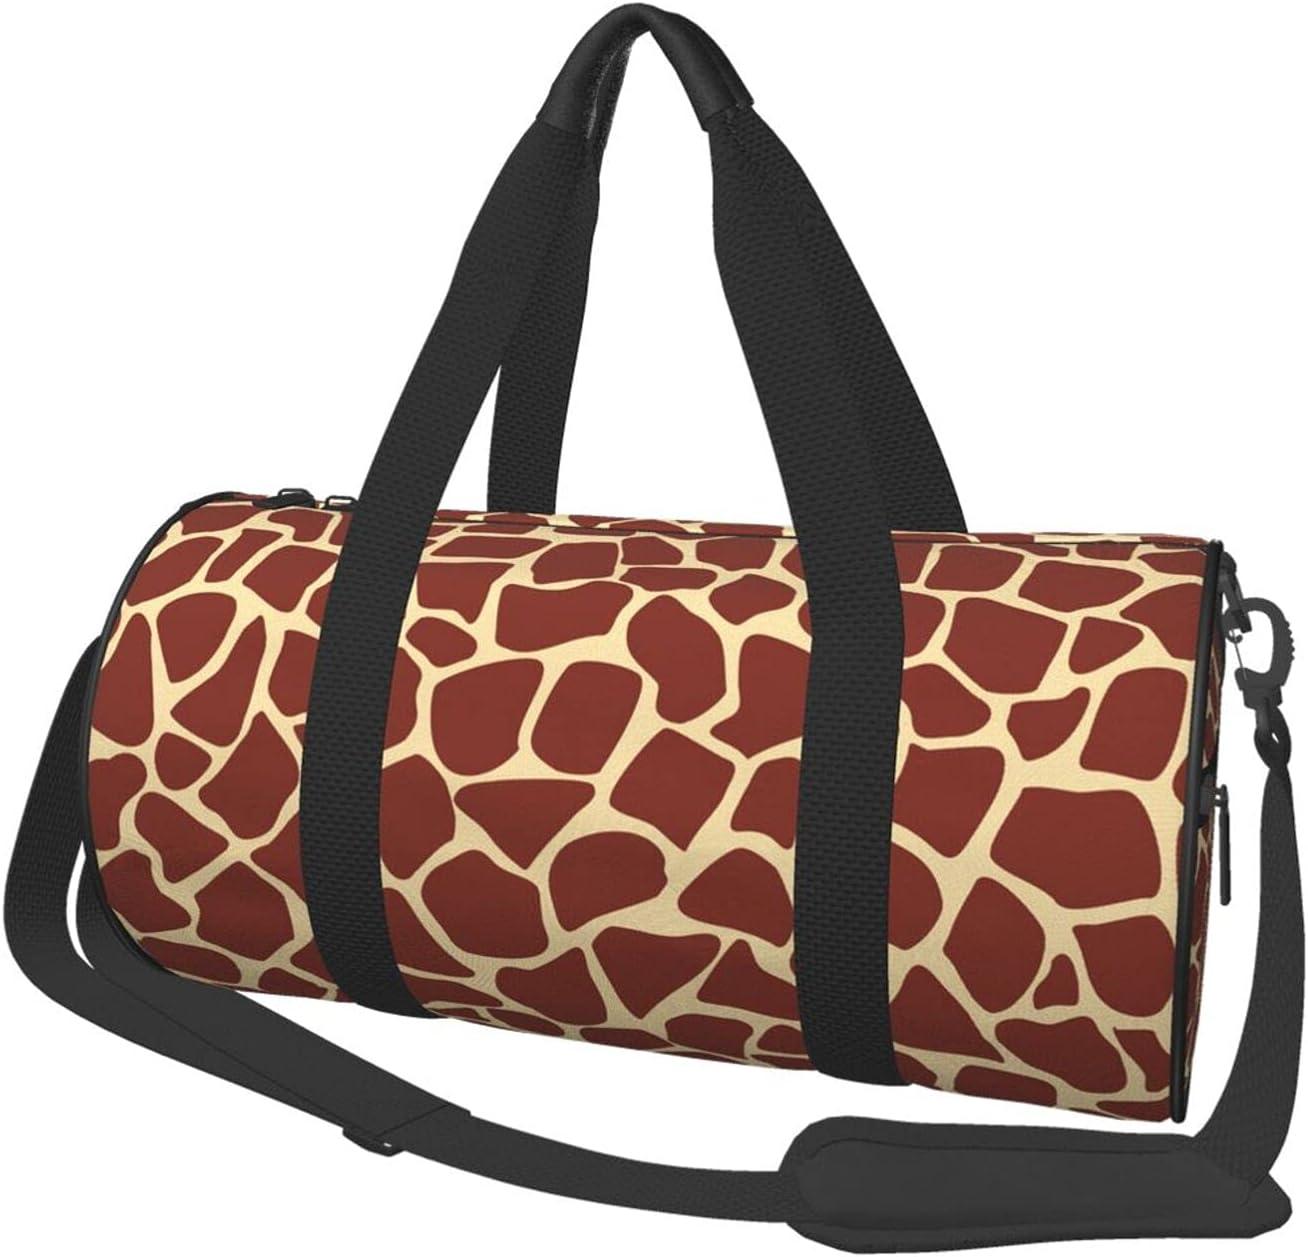 Travel Bags Brown Giraffe Fur OFFicial shop Men Women's Large D Pattern Ranking TOP15